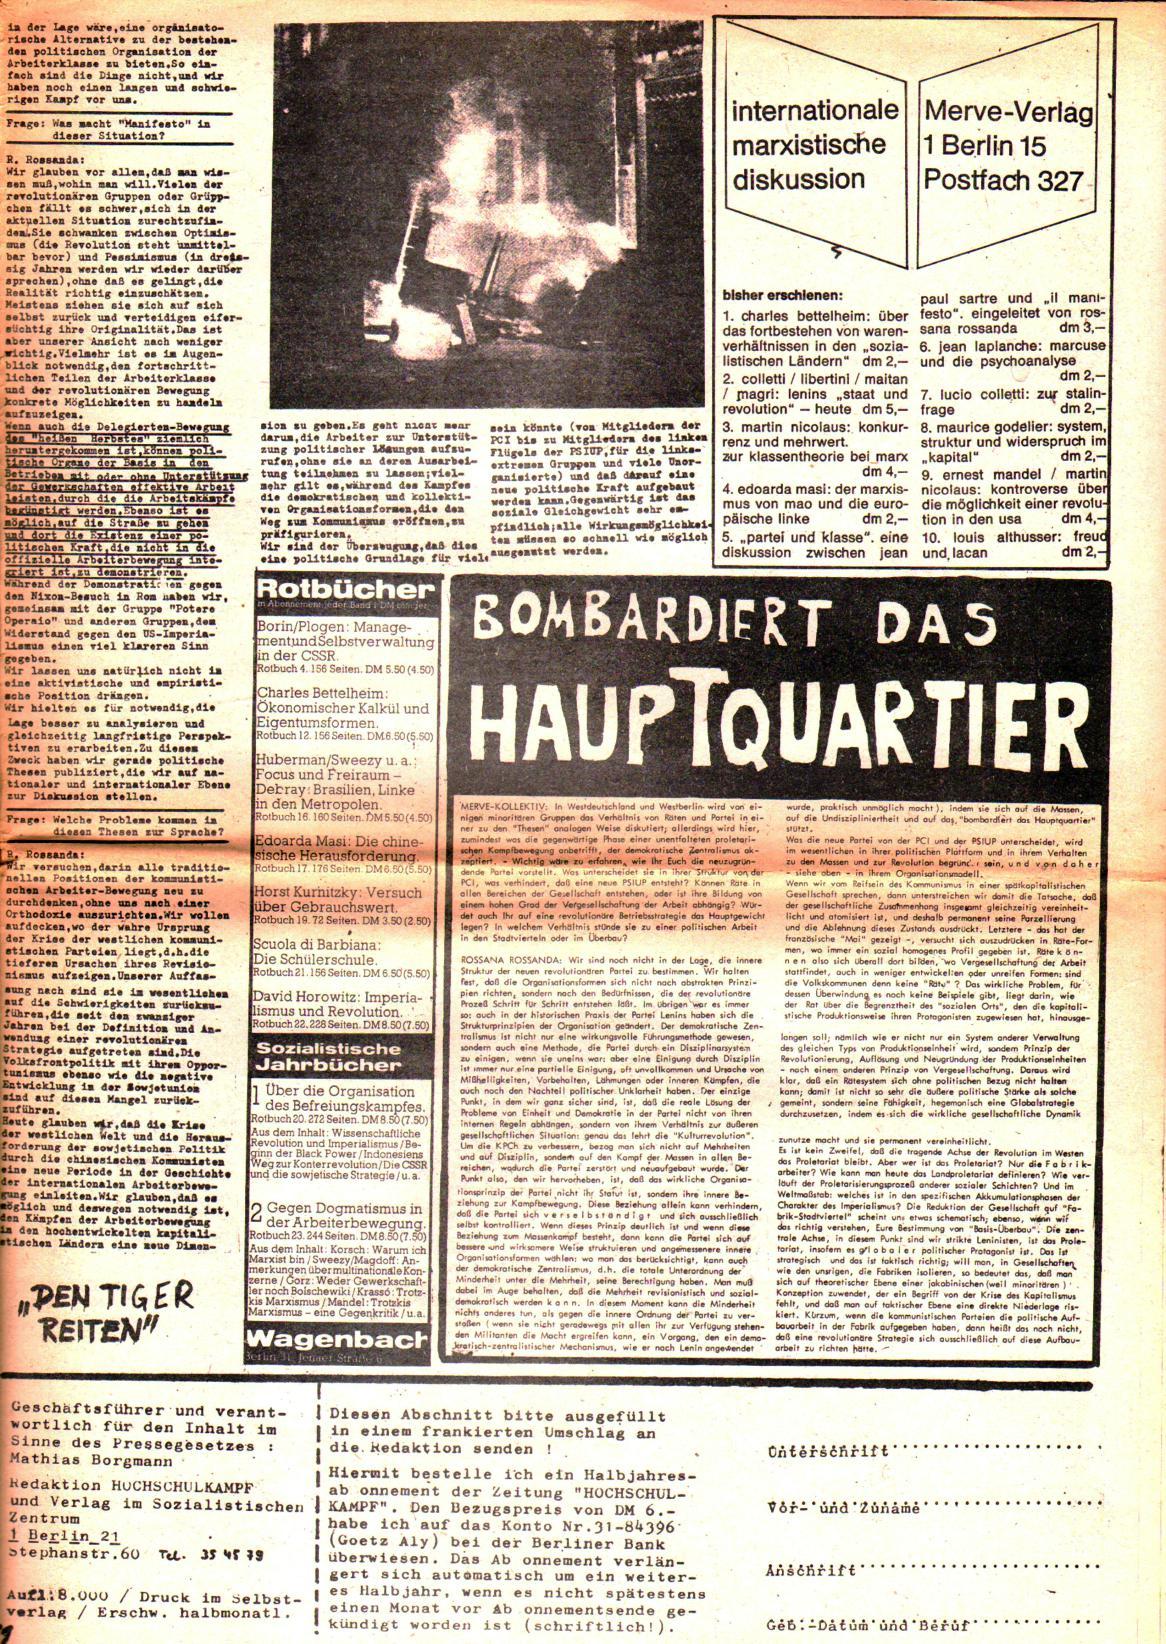 Berlin_Hochschulkampf_1971_03_11